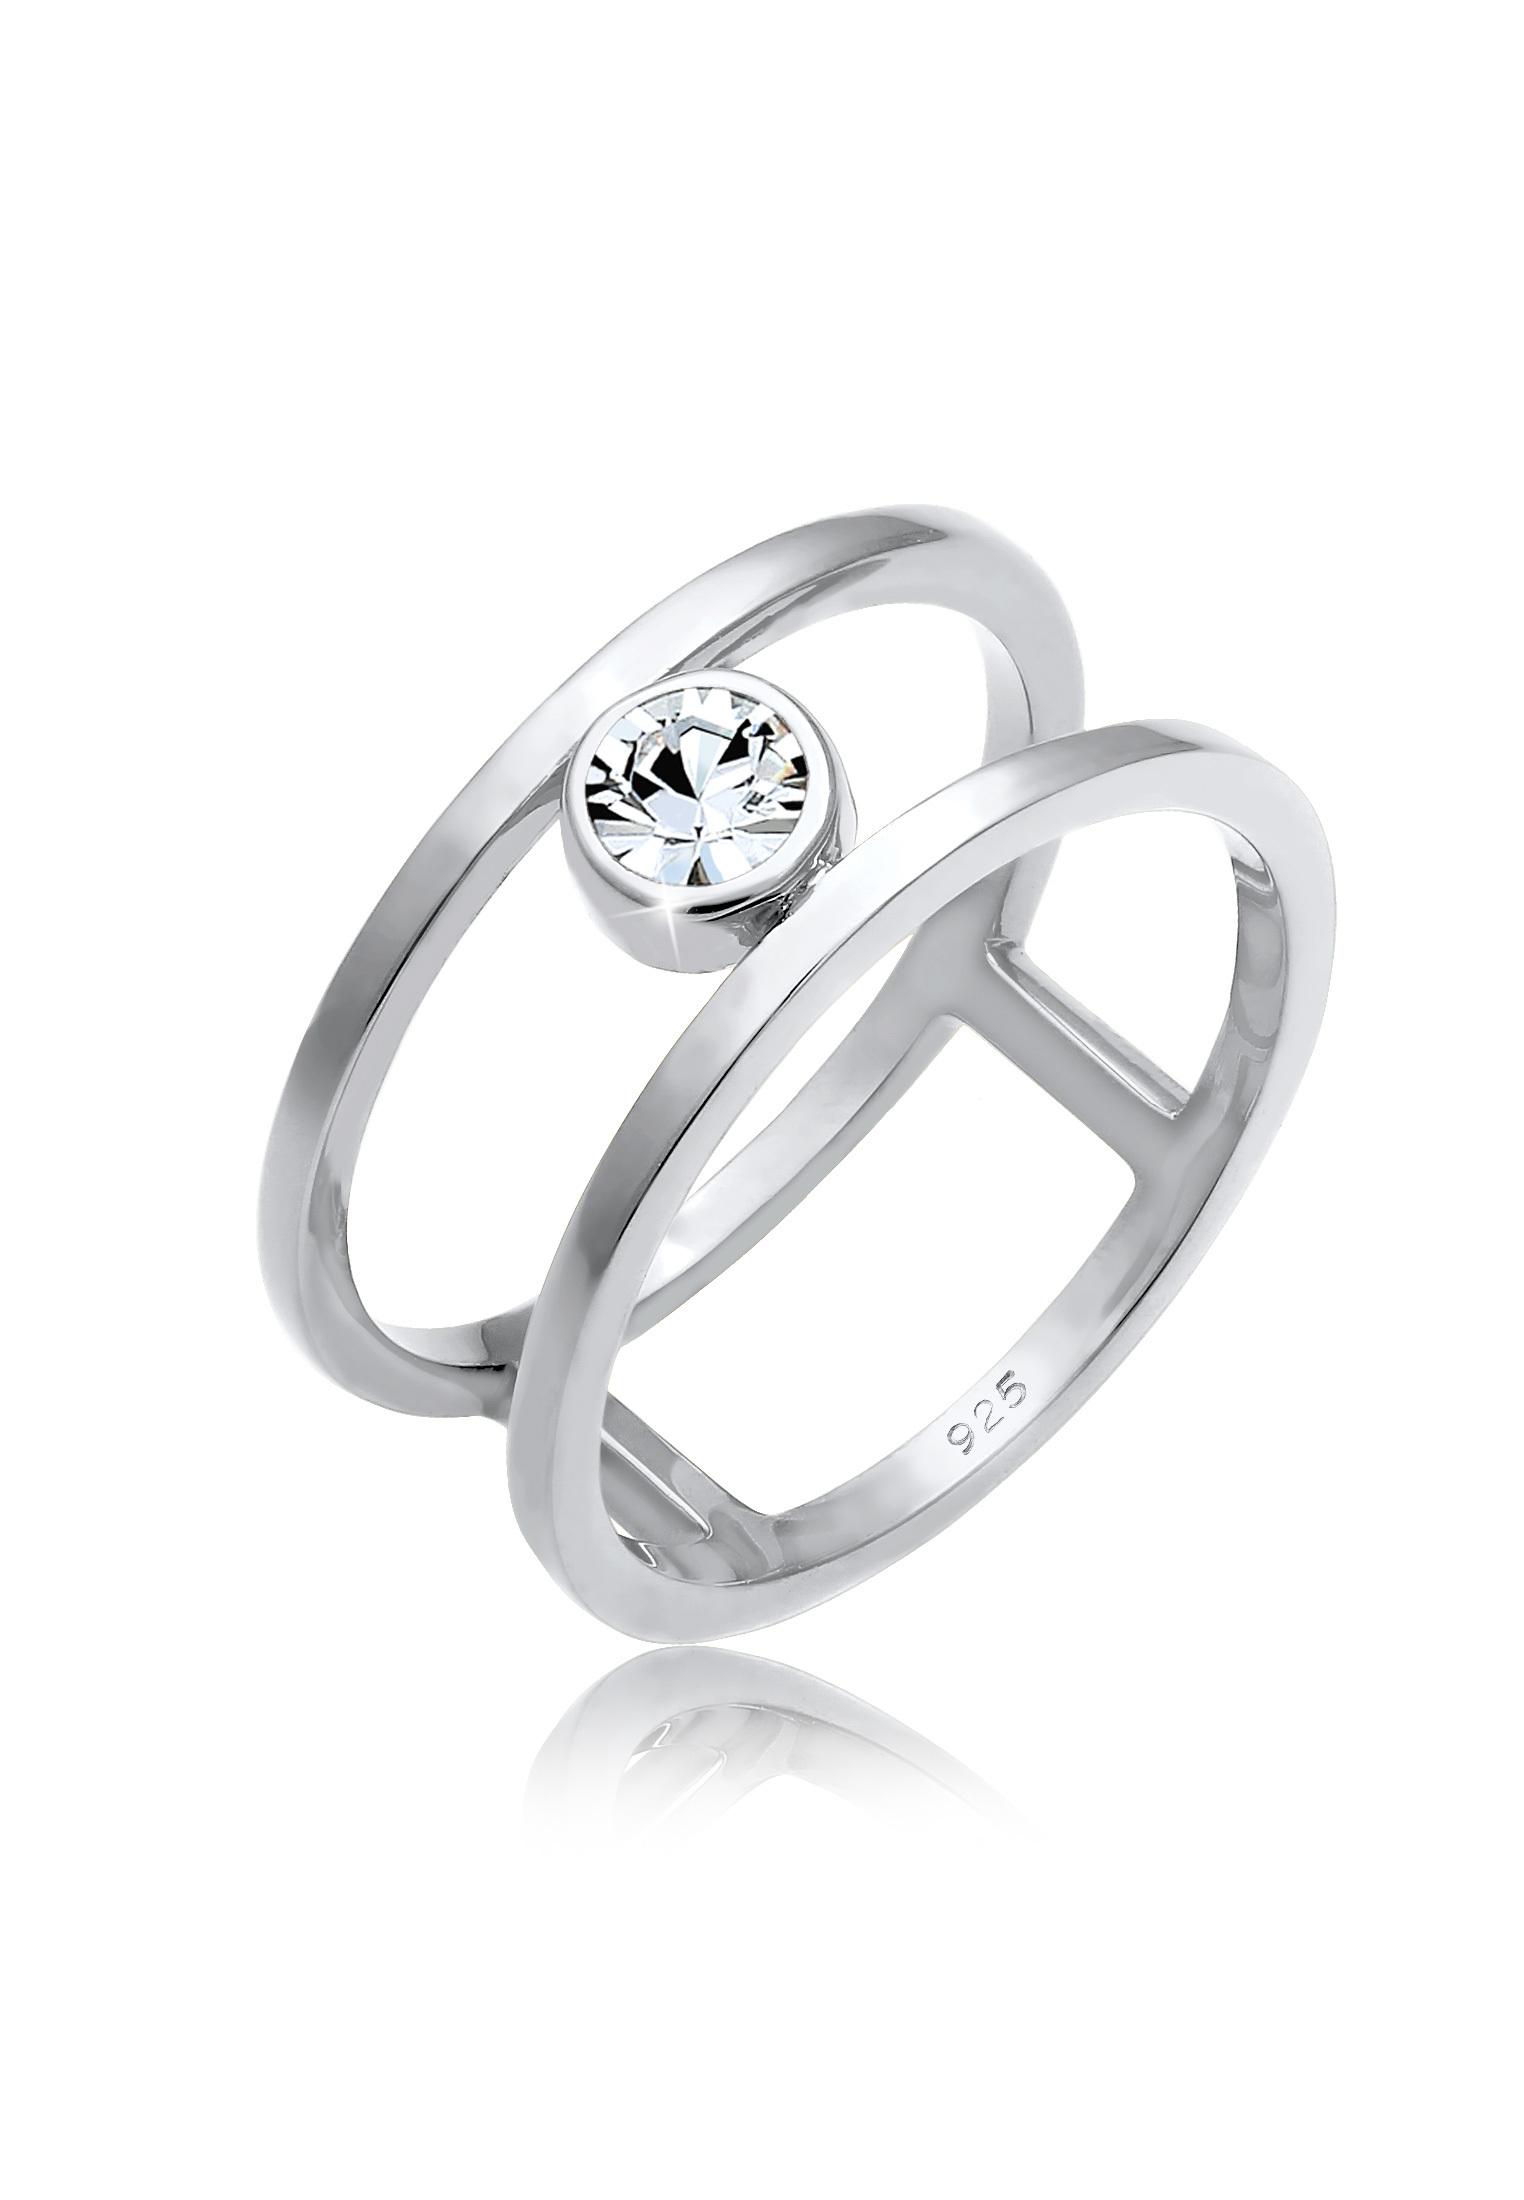 Ring | Kristall ( Weiß ) | 925er Sterling Silber